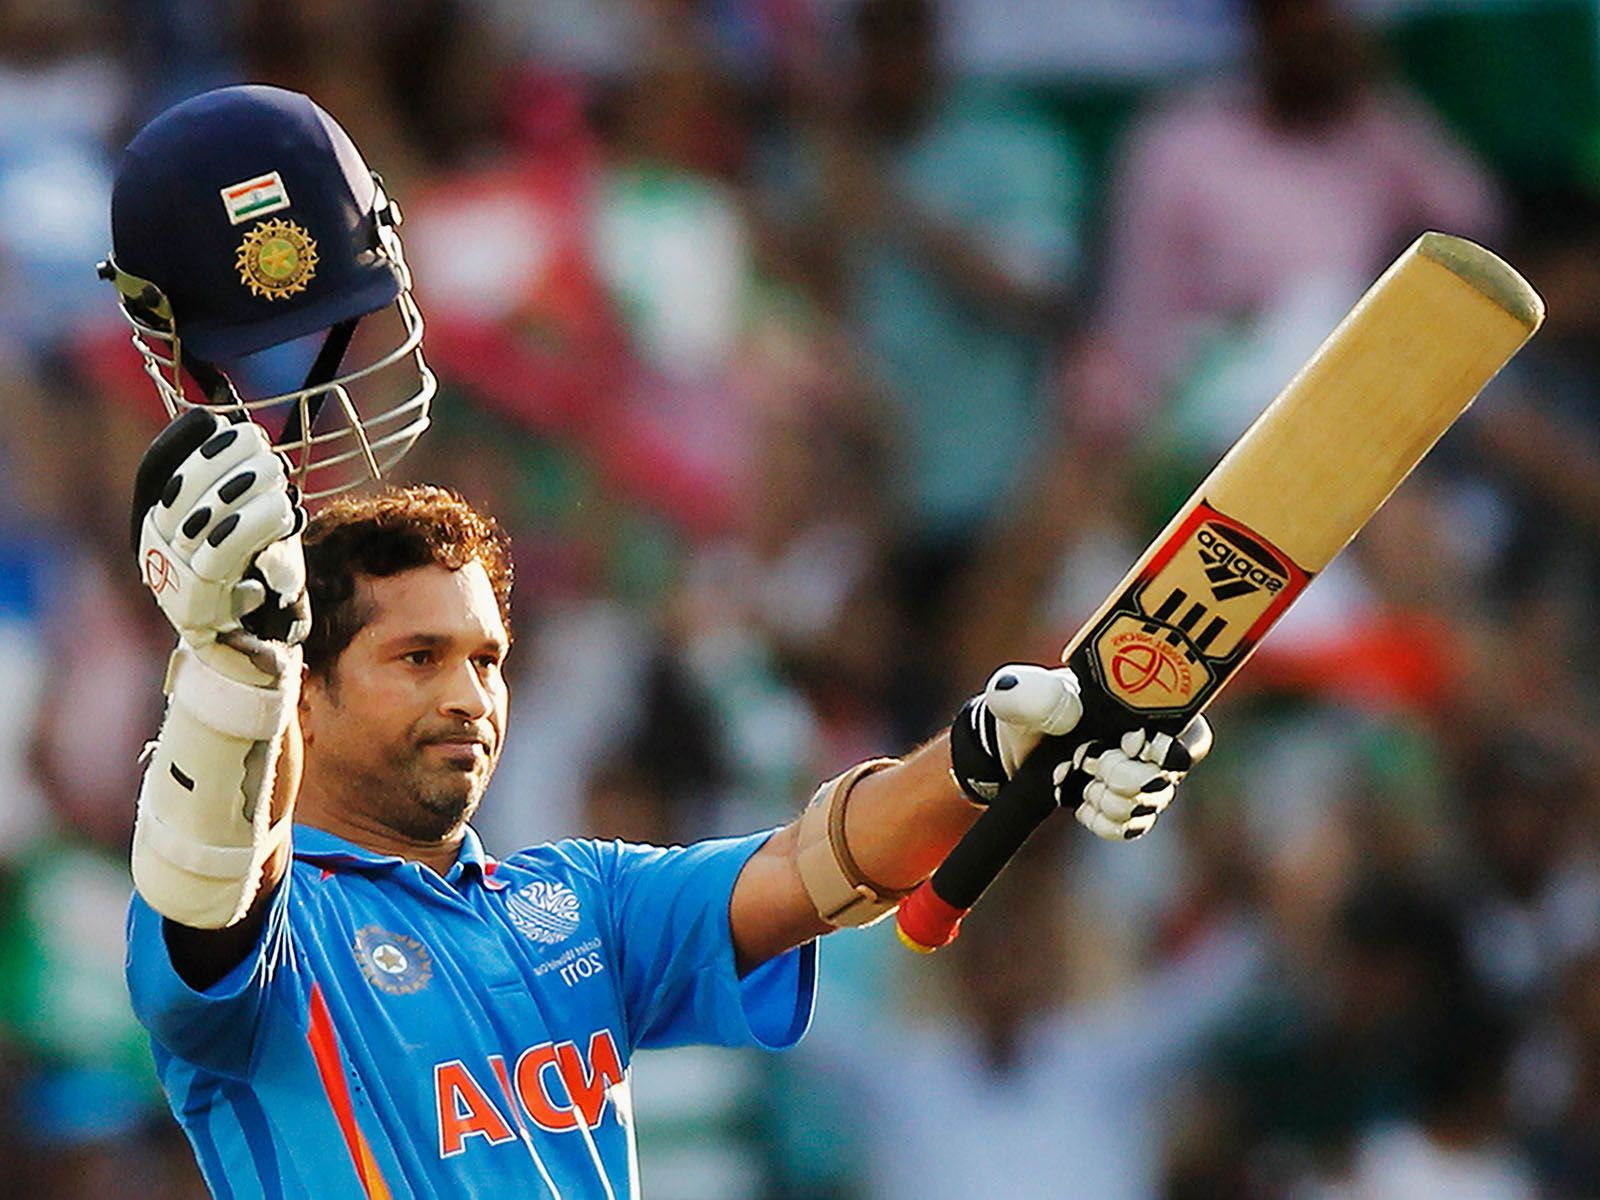 Sachin Tendulkar Dark Painting Hd Wallpaper Hd Sachin Tendulkar Cricket Wallpapers Cricket